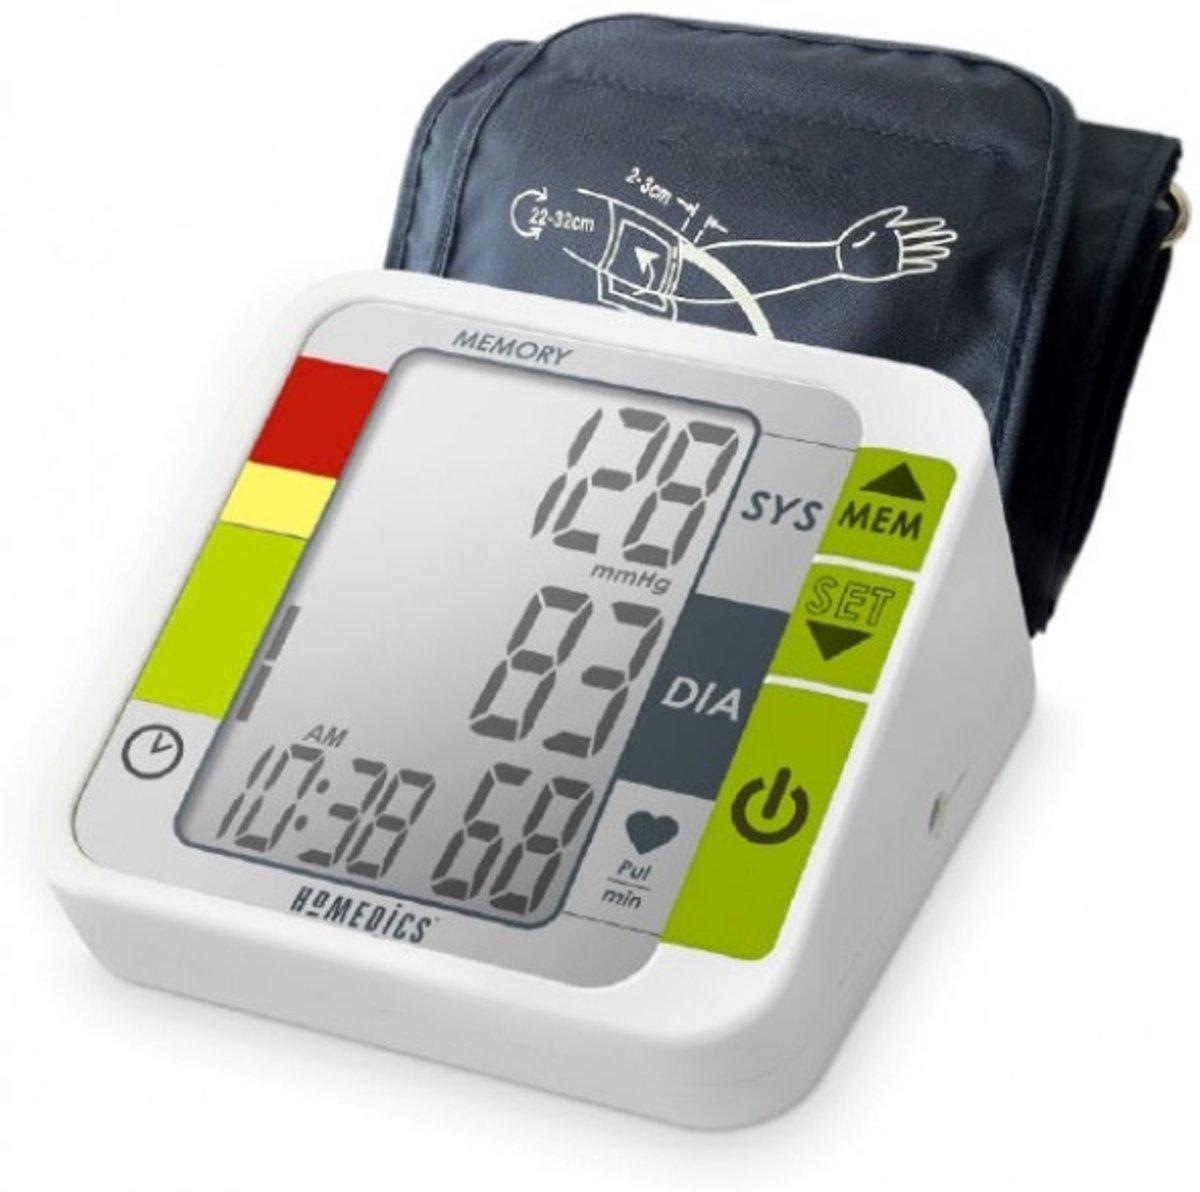 HoMedics BPA-2000-EU Automatic Bovenarm Bloeddrukmeter